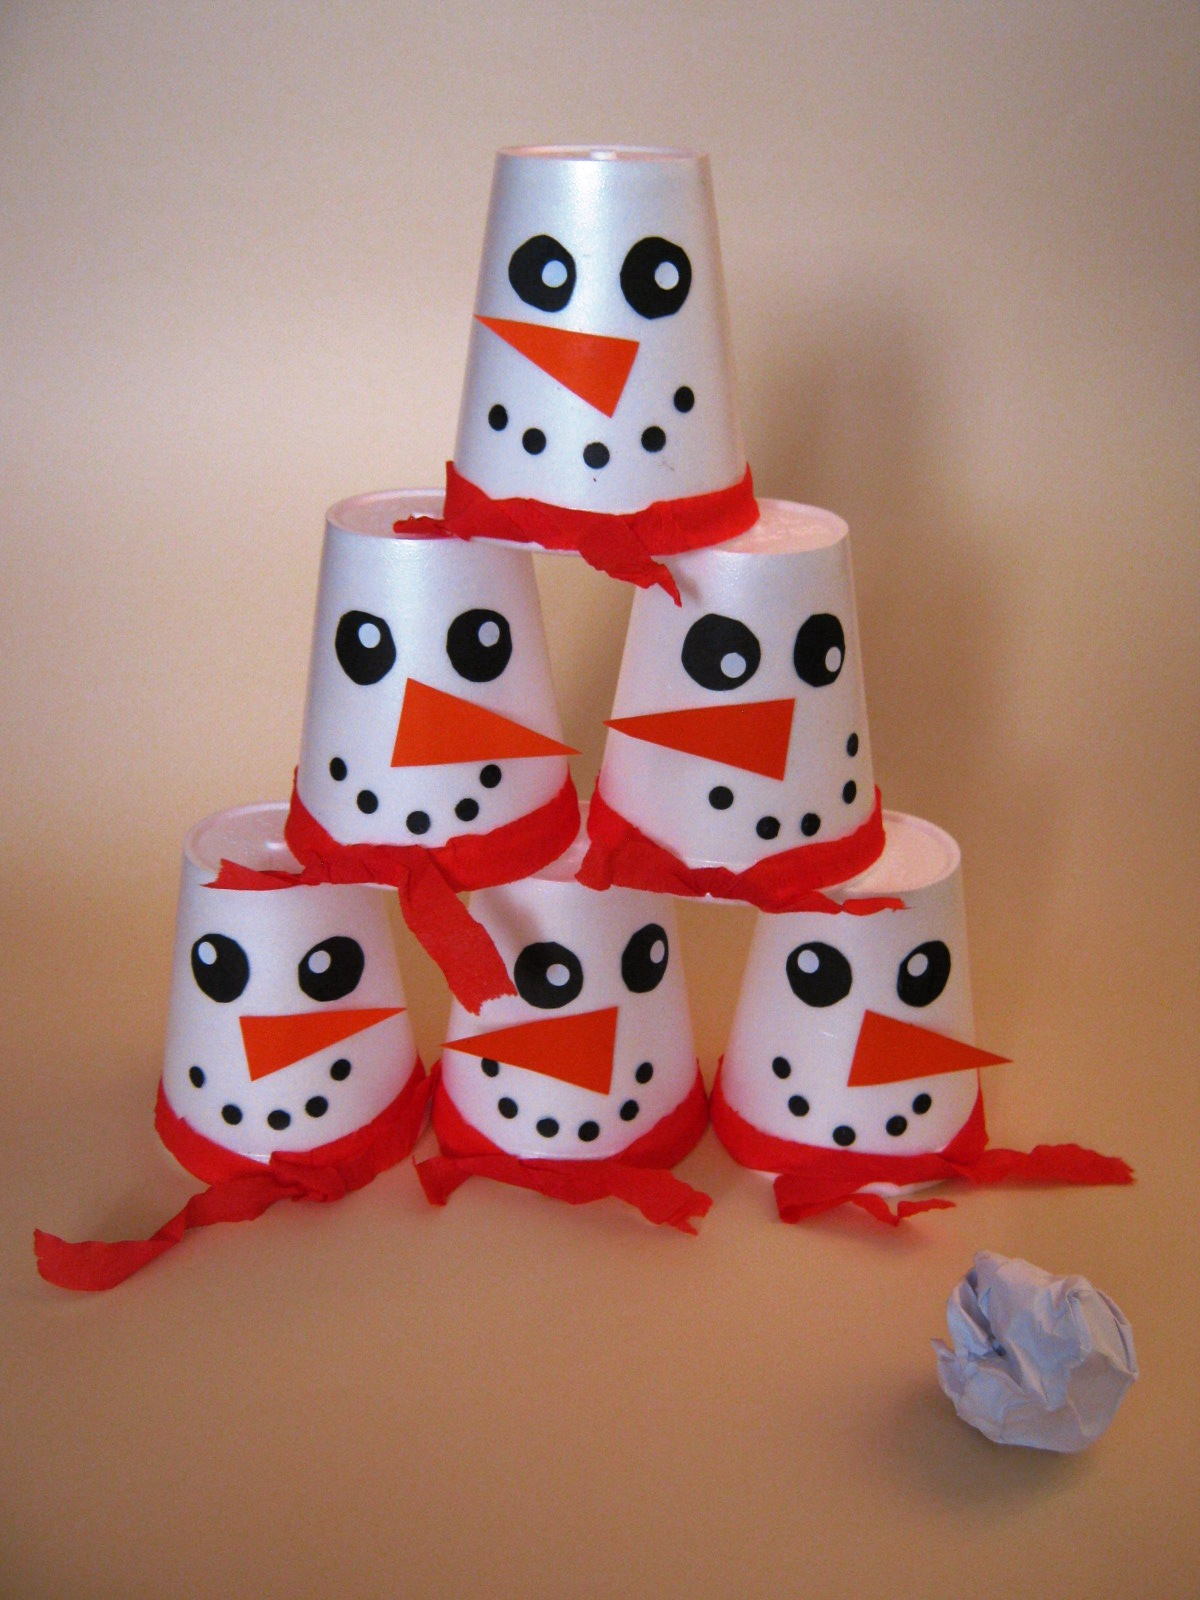 paper-cup-snowman-craft u00ab funnycrafts